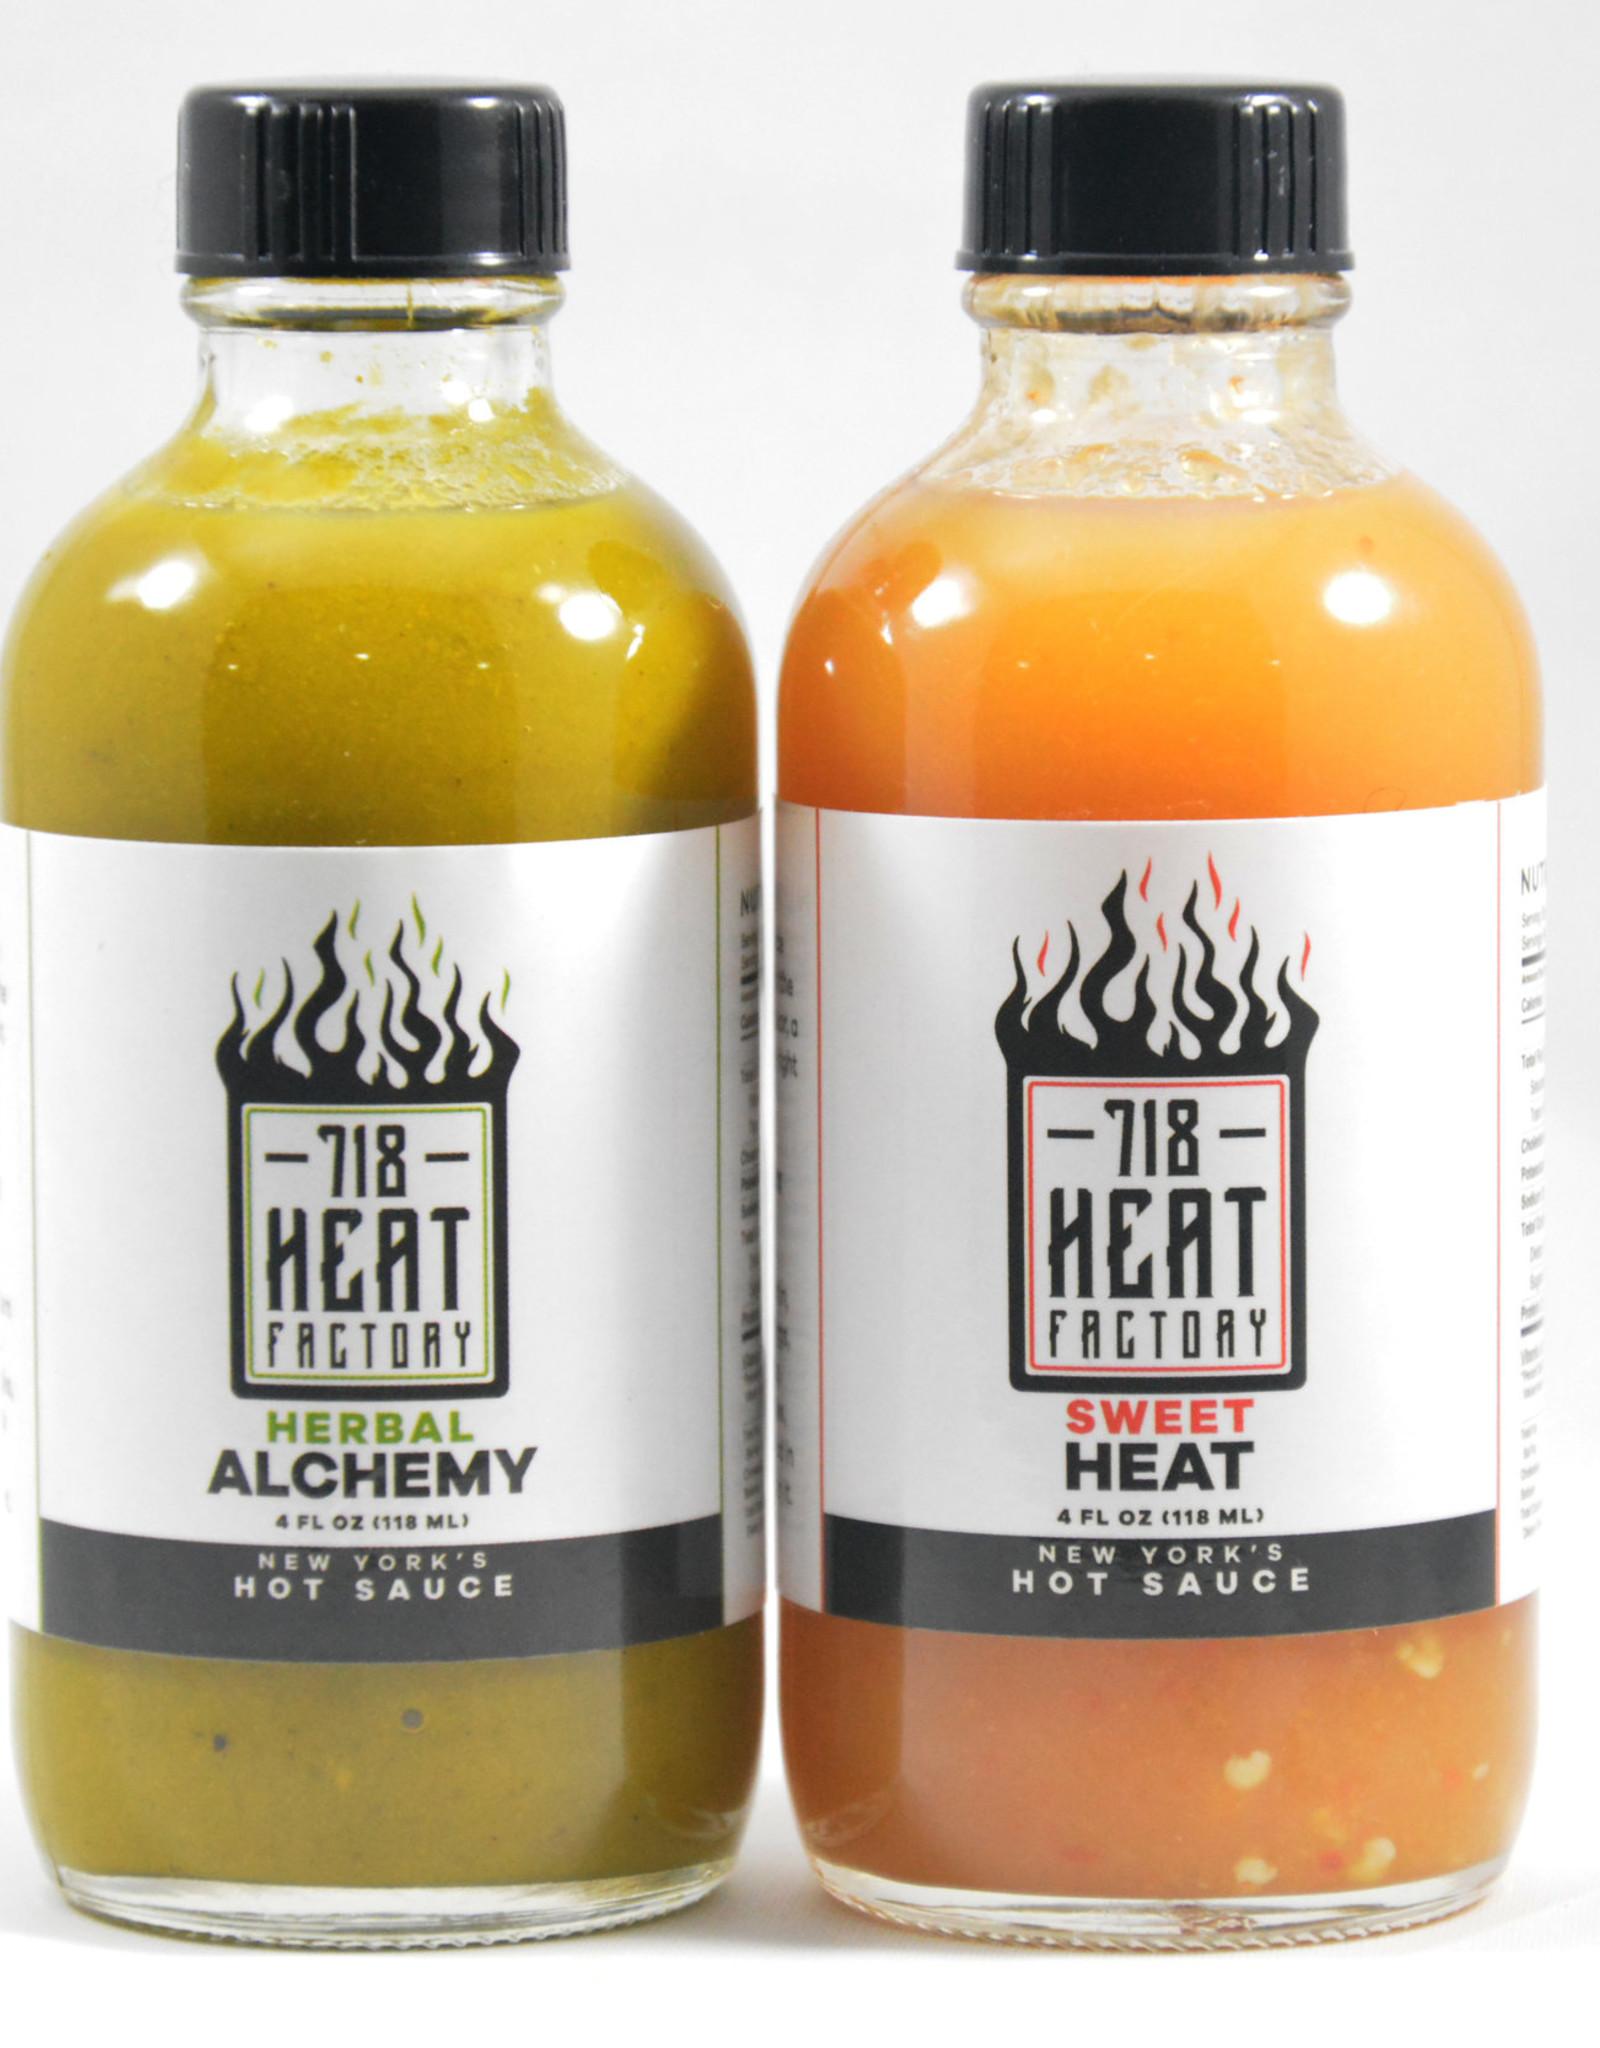 718 Heat Factory 718 Hot Sauce - 8oz